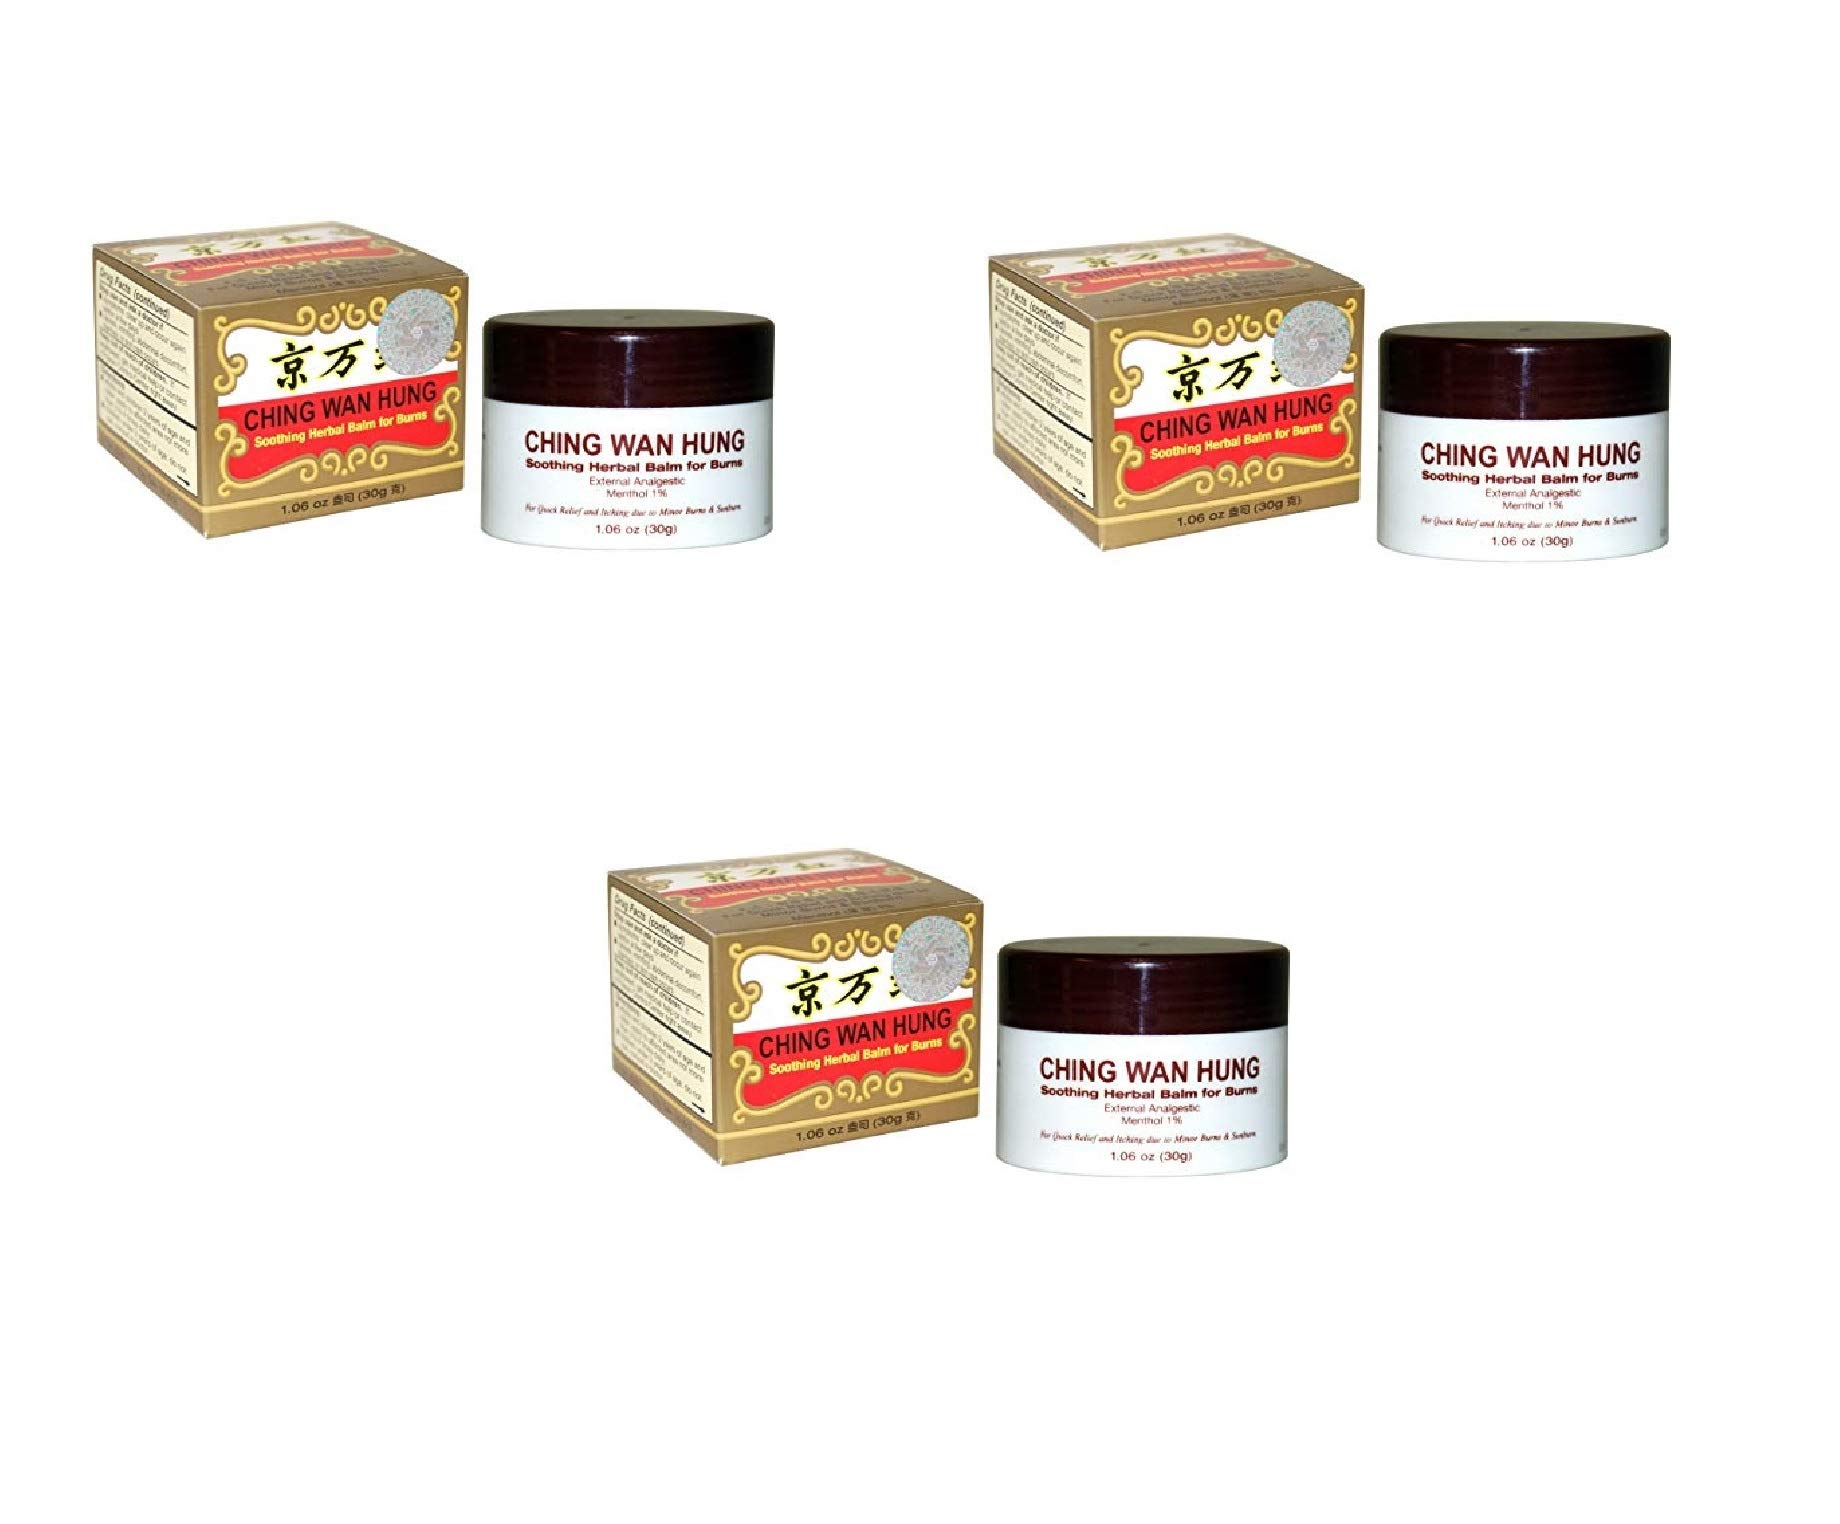 Ching WAN Hung - Soothing Herbal Balm (1.06 Oz/30 Gram) (3 Pack)